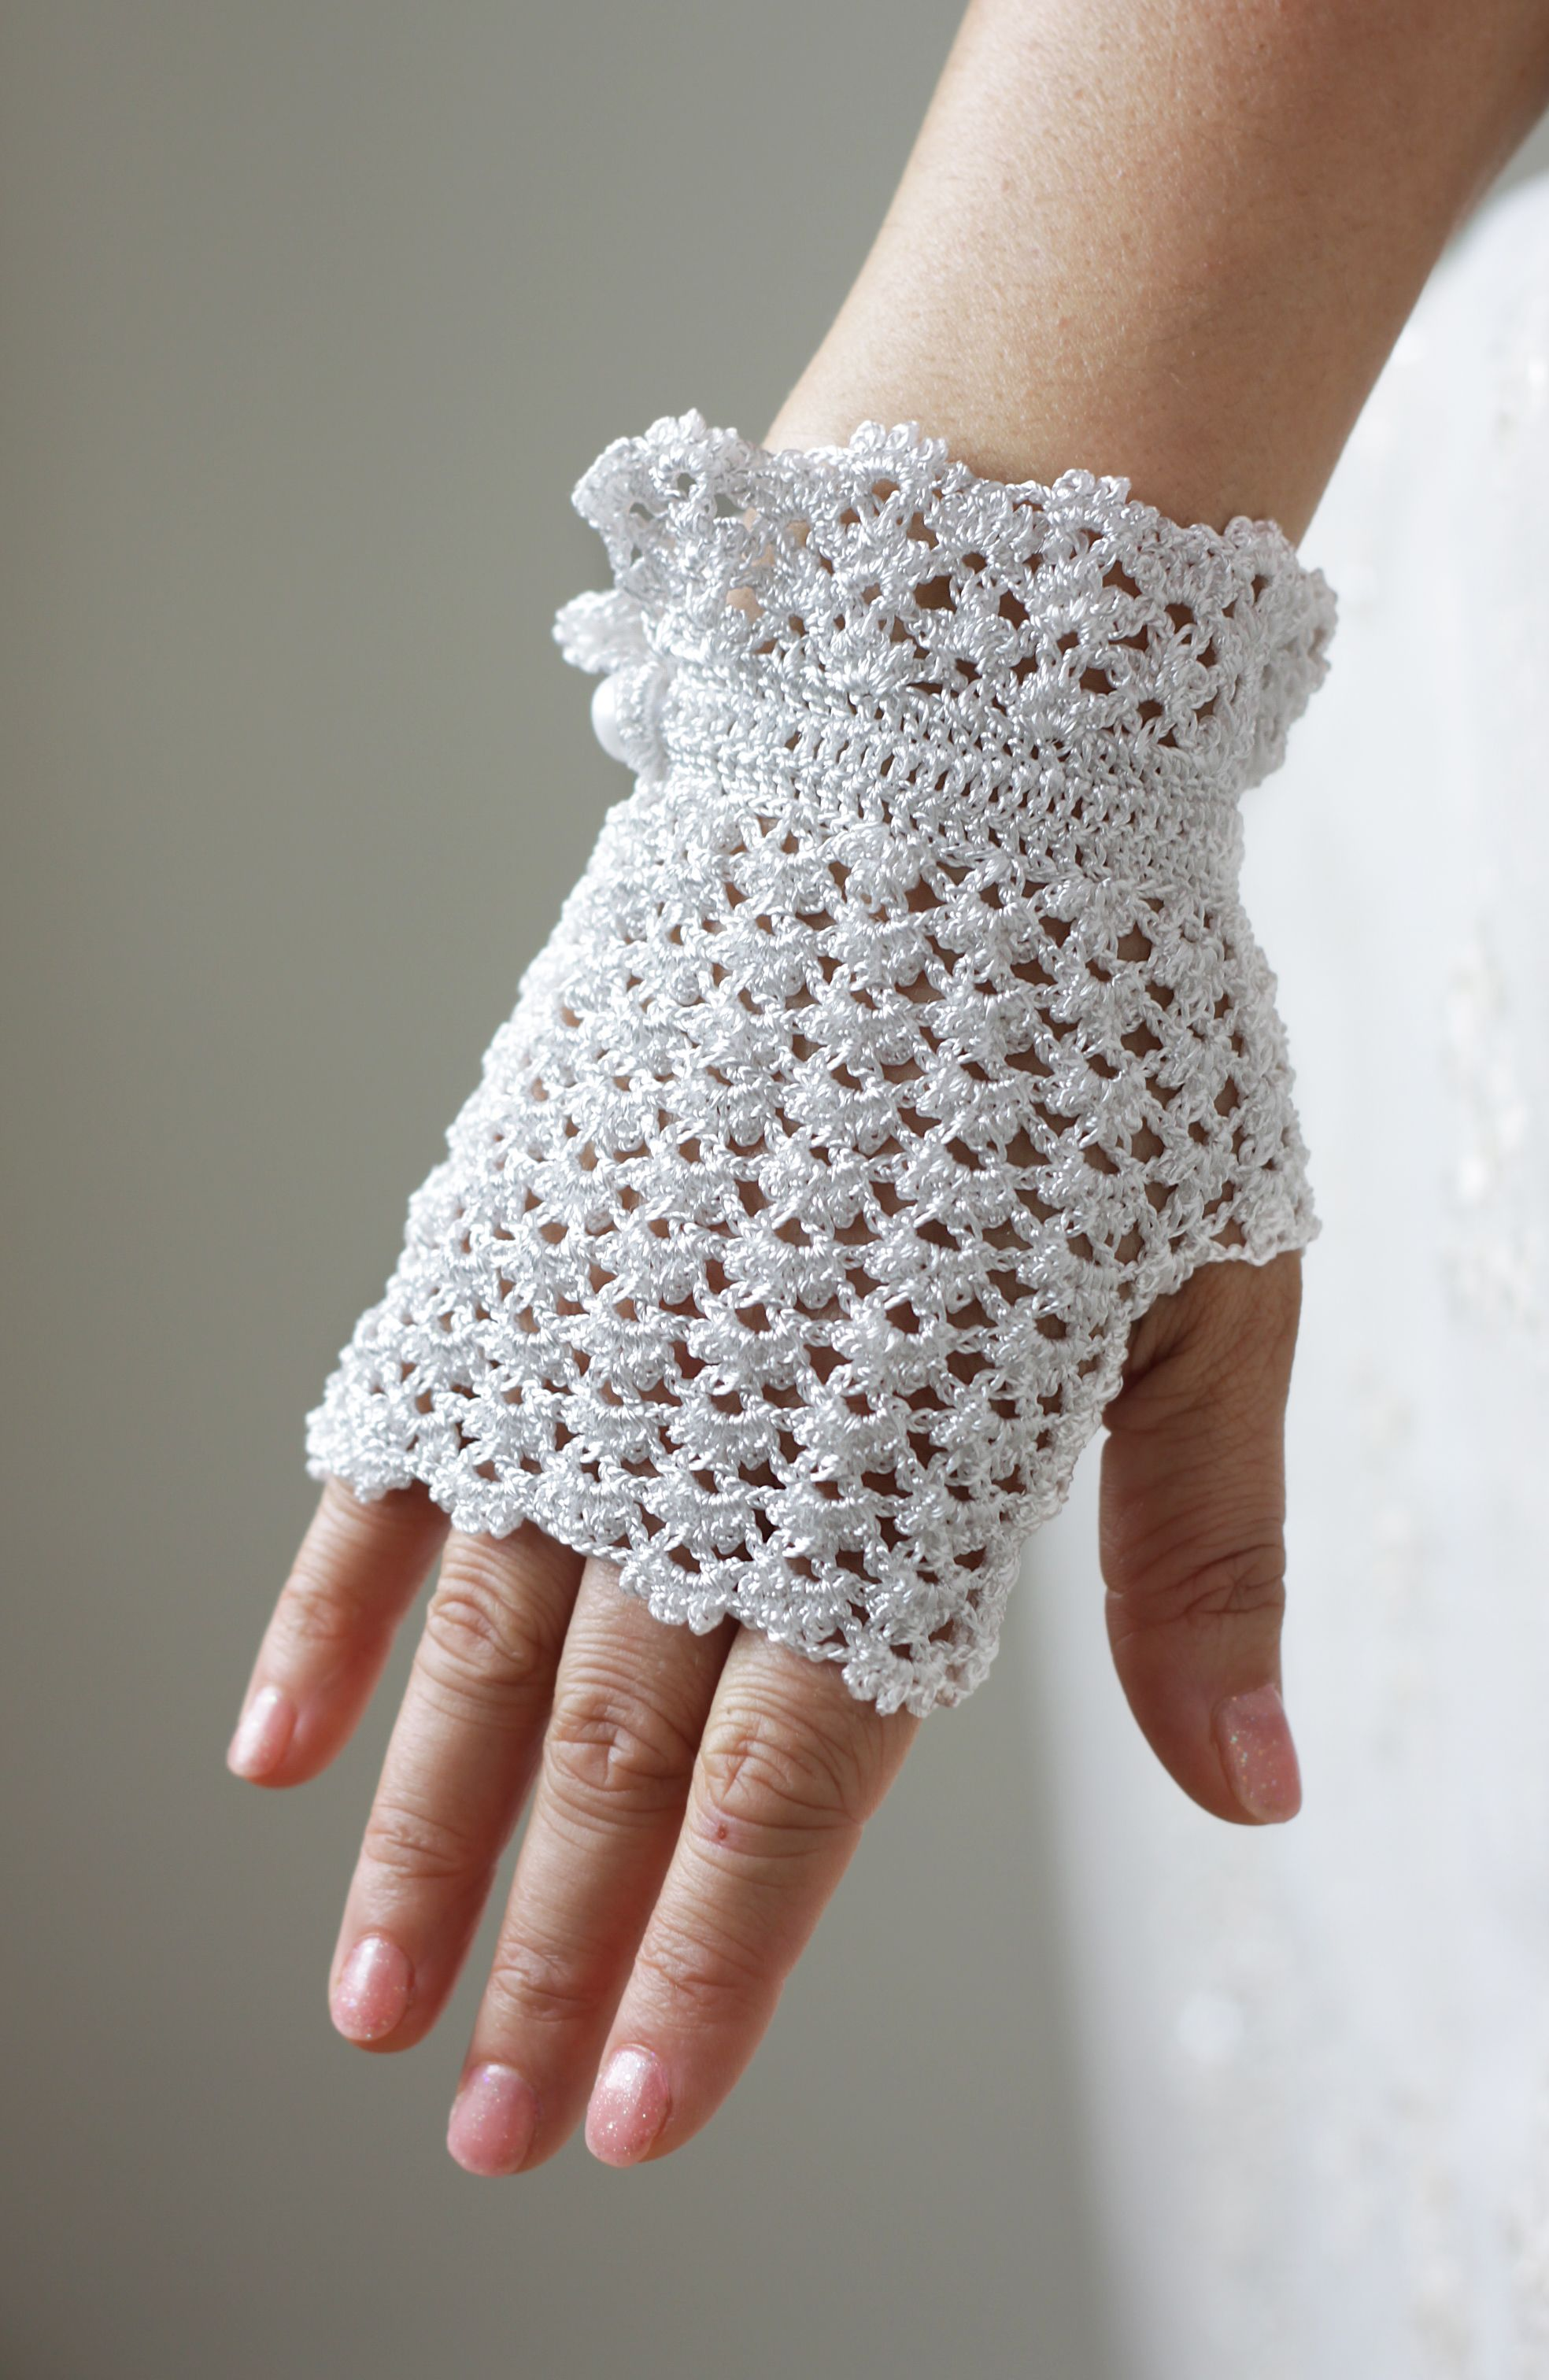 Fingerless gloves eso - Grey Knit Gloves Fingerless Gloves Knit Wrist Cuffs Frilly Gloves Ruffle Gloves Womens Grey Gloves Knit Wrist Warmers